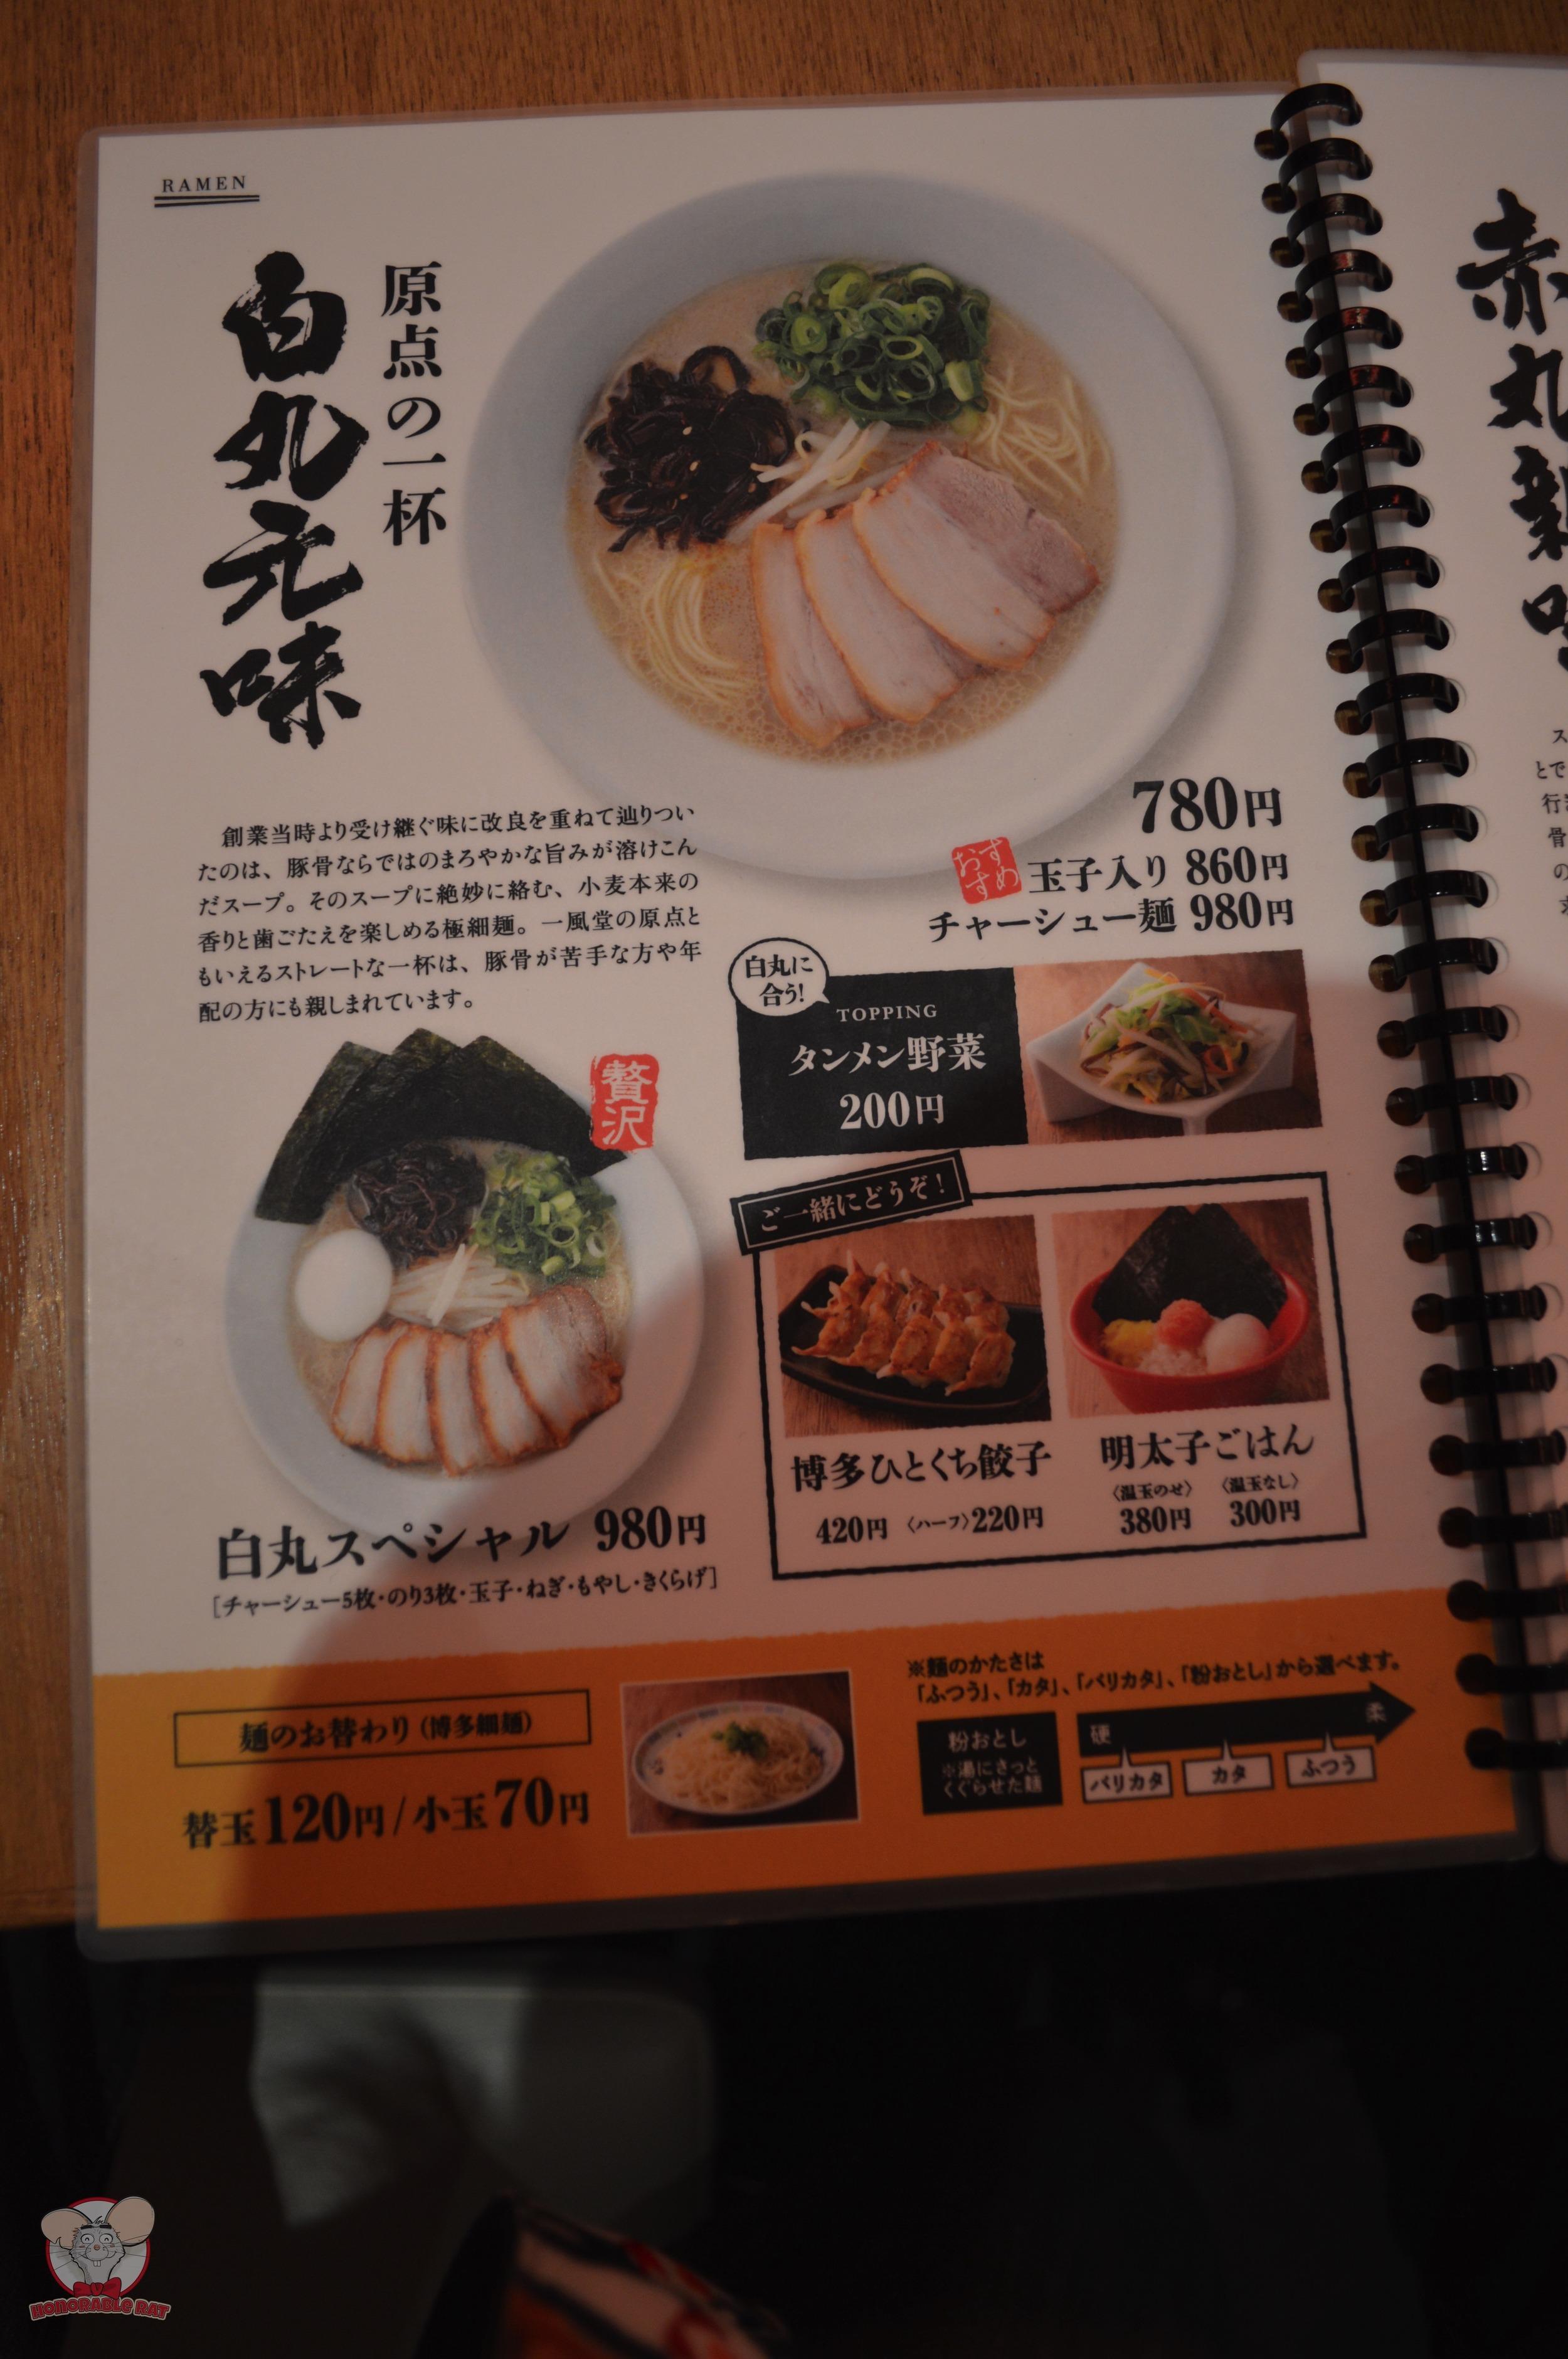 Shiromaru: 780 yen for a basic bowl (leek, sliced mushrooms and bean sprouts)   860 yen for a basic bowl with an egg   980 yen for a basic bowl with char siew   980 yen for the special (basic bowl plus char siew, an egg and seaweed)